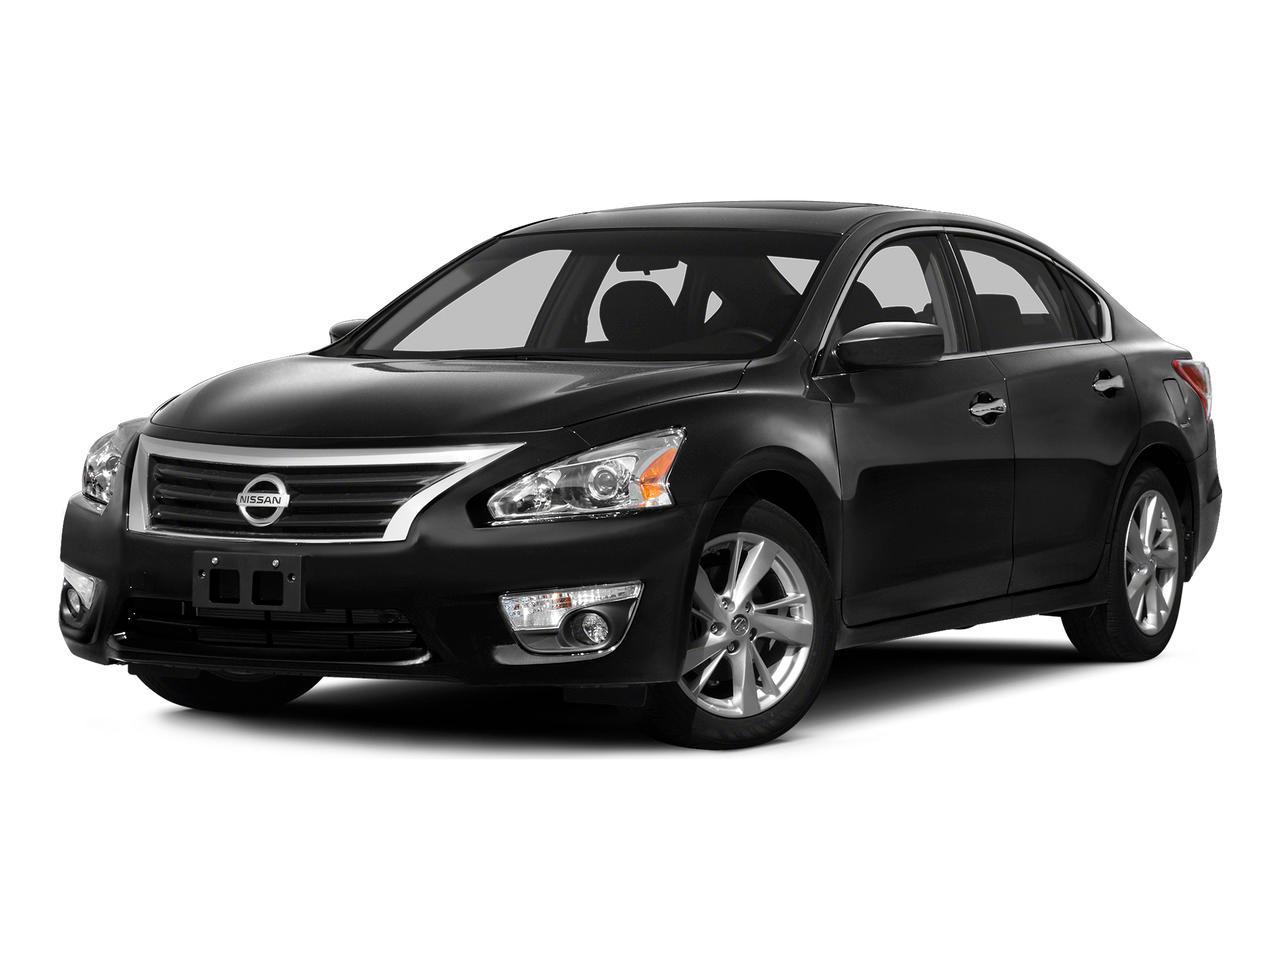 2015 Nissan Altima Vehicle Photo in Houston, TX 77090